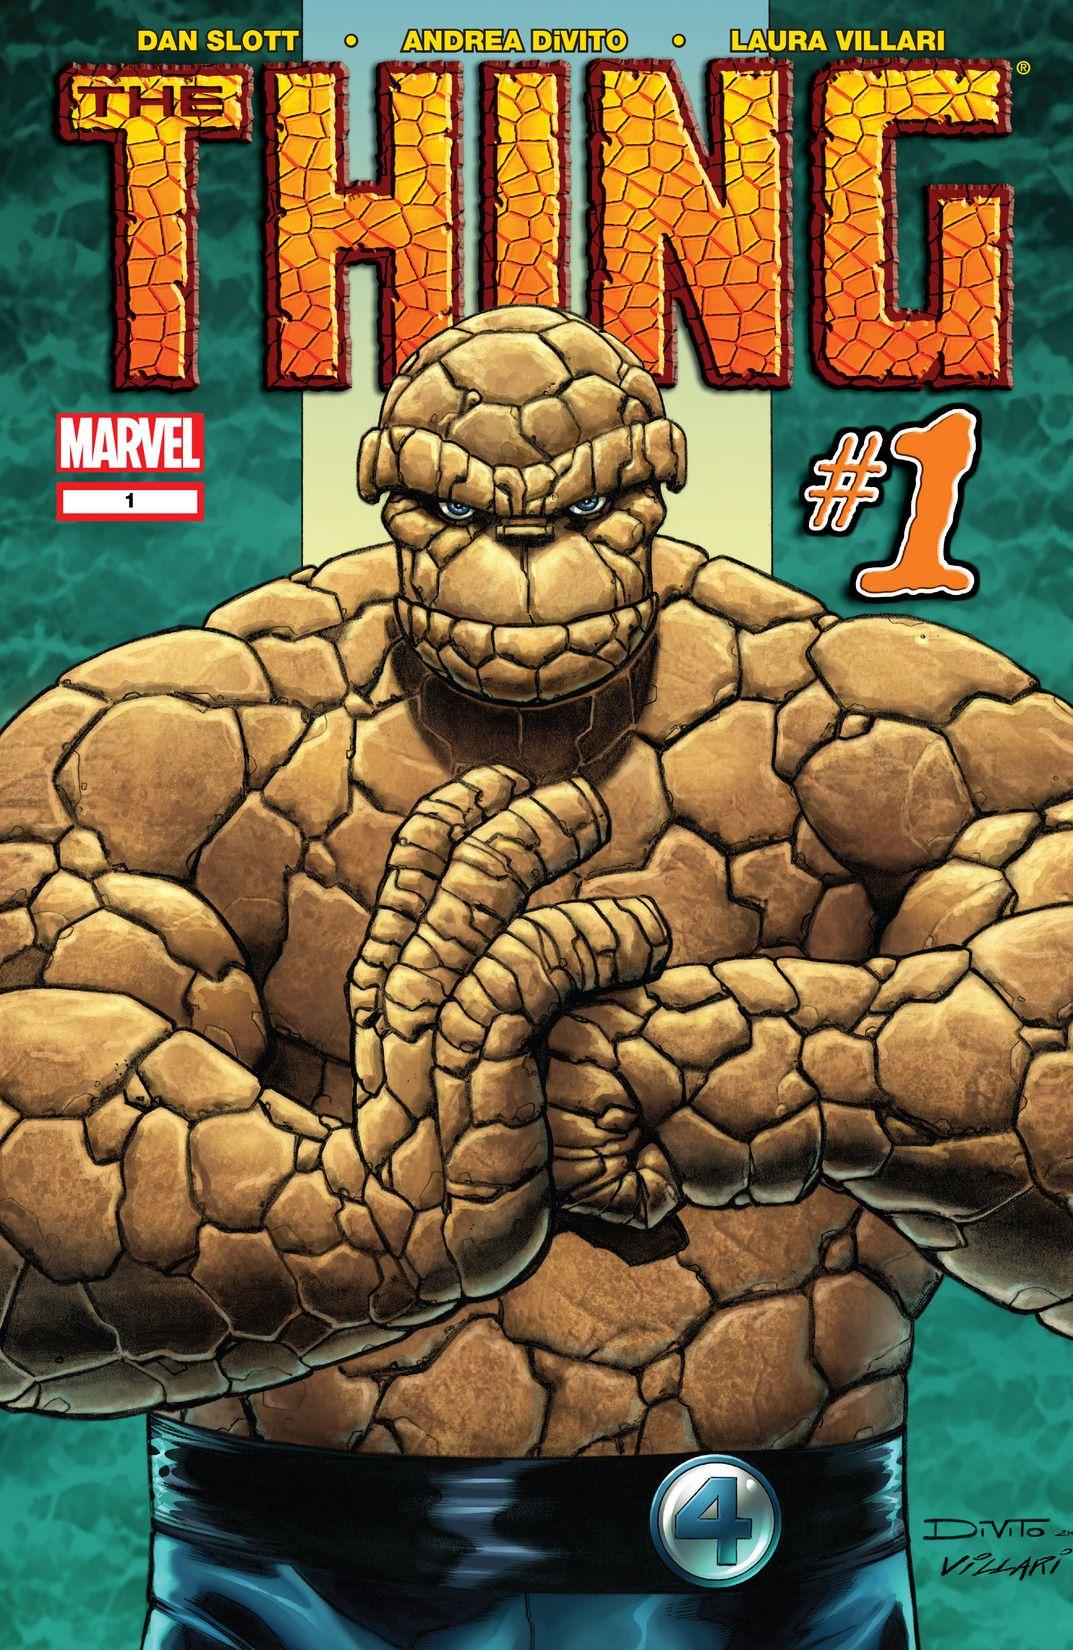 Comixology Free Marvel Digital Comics - Daredevil, Iron Man, Bullseye, The Thing